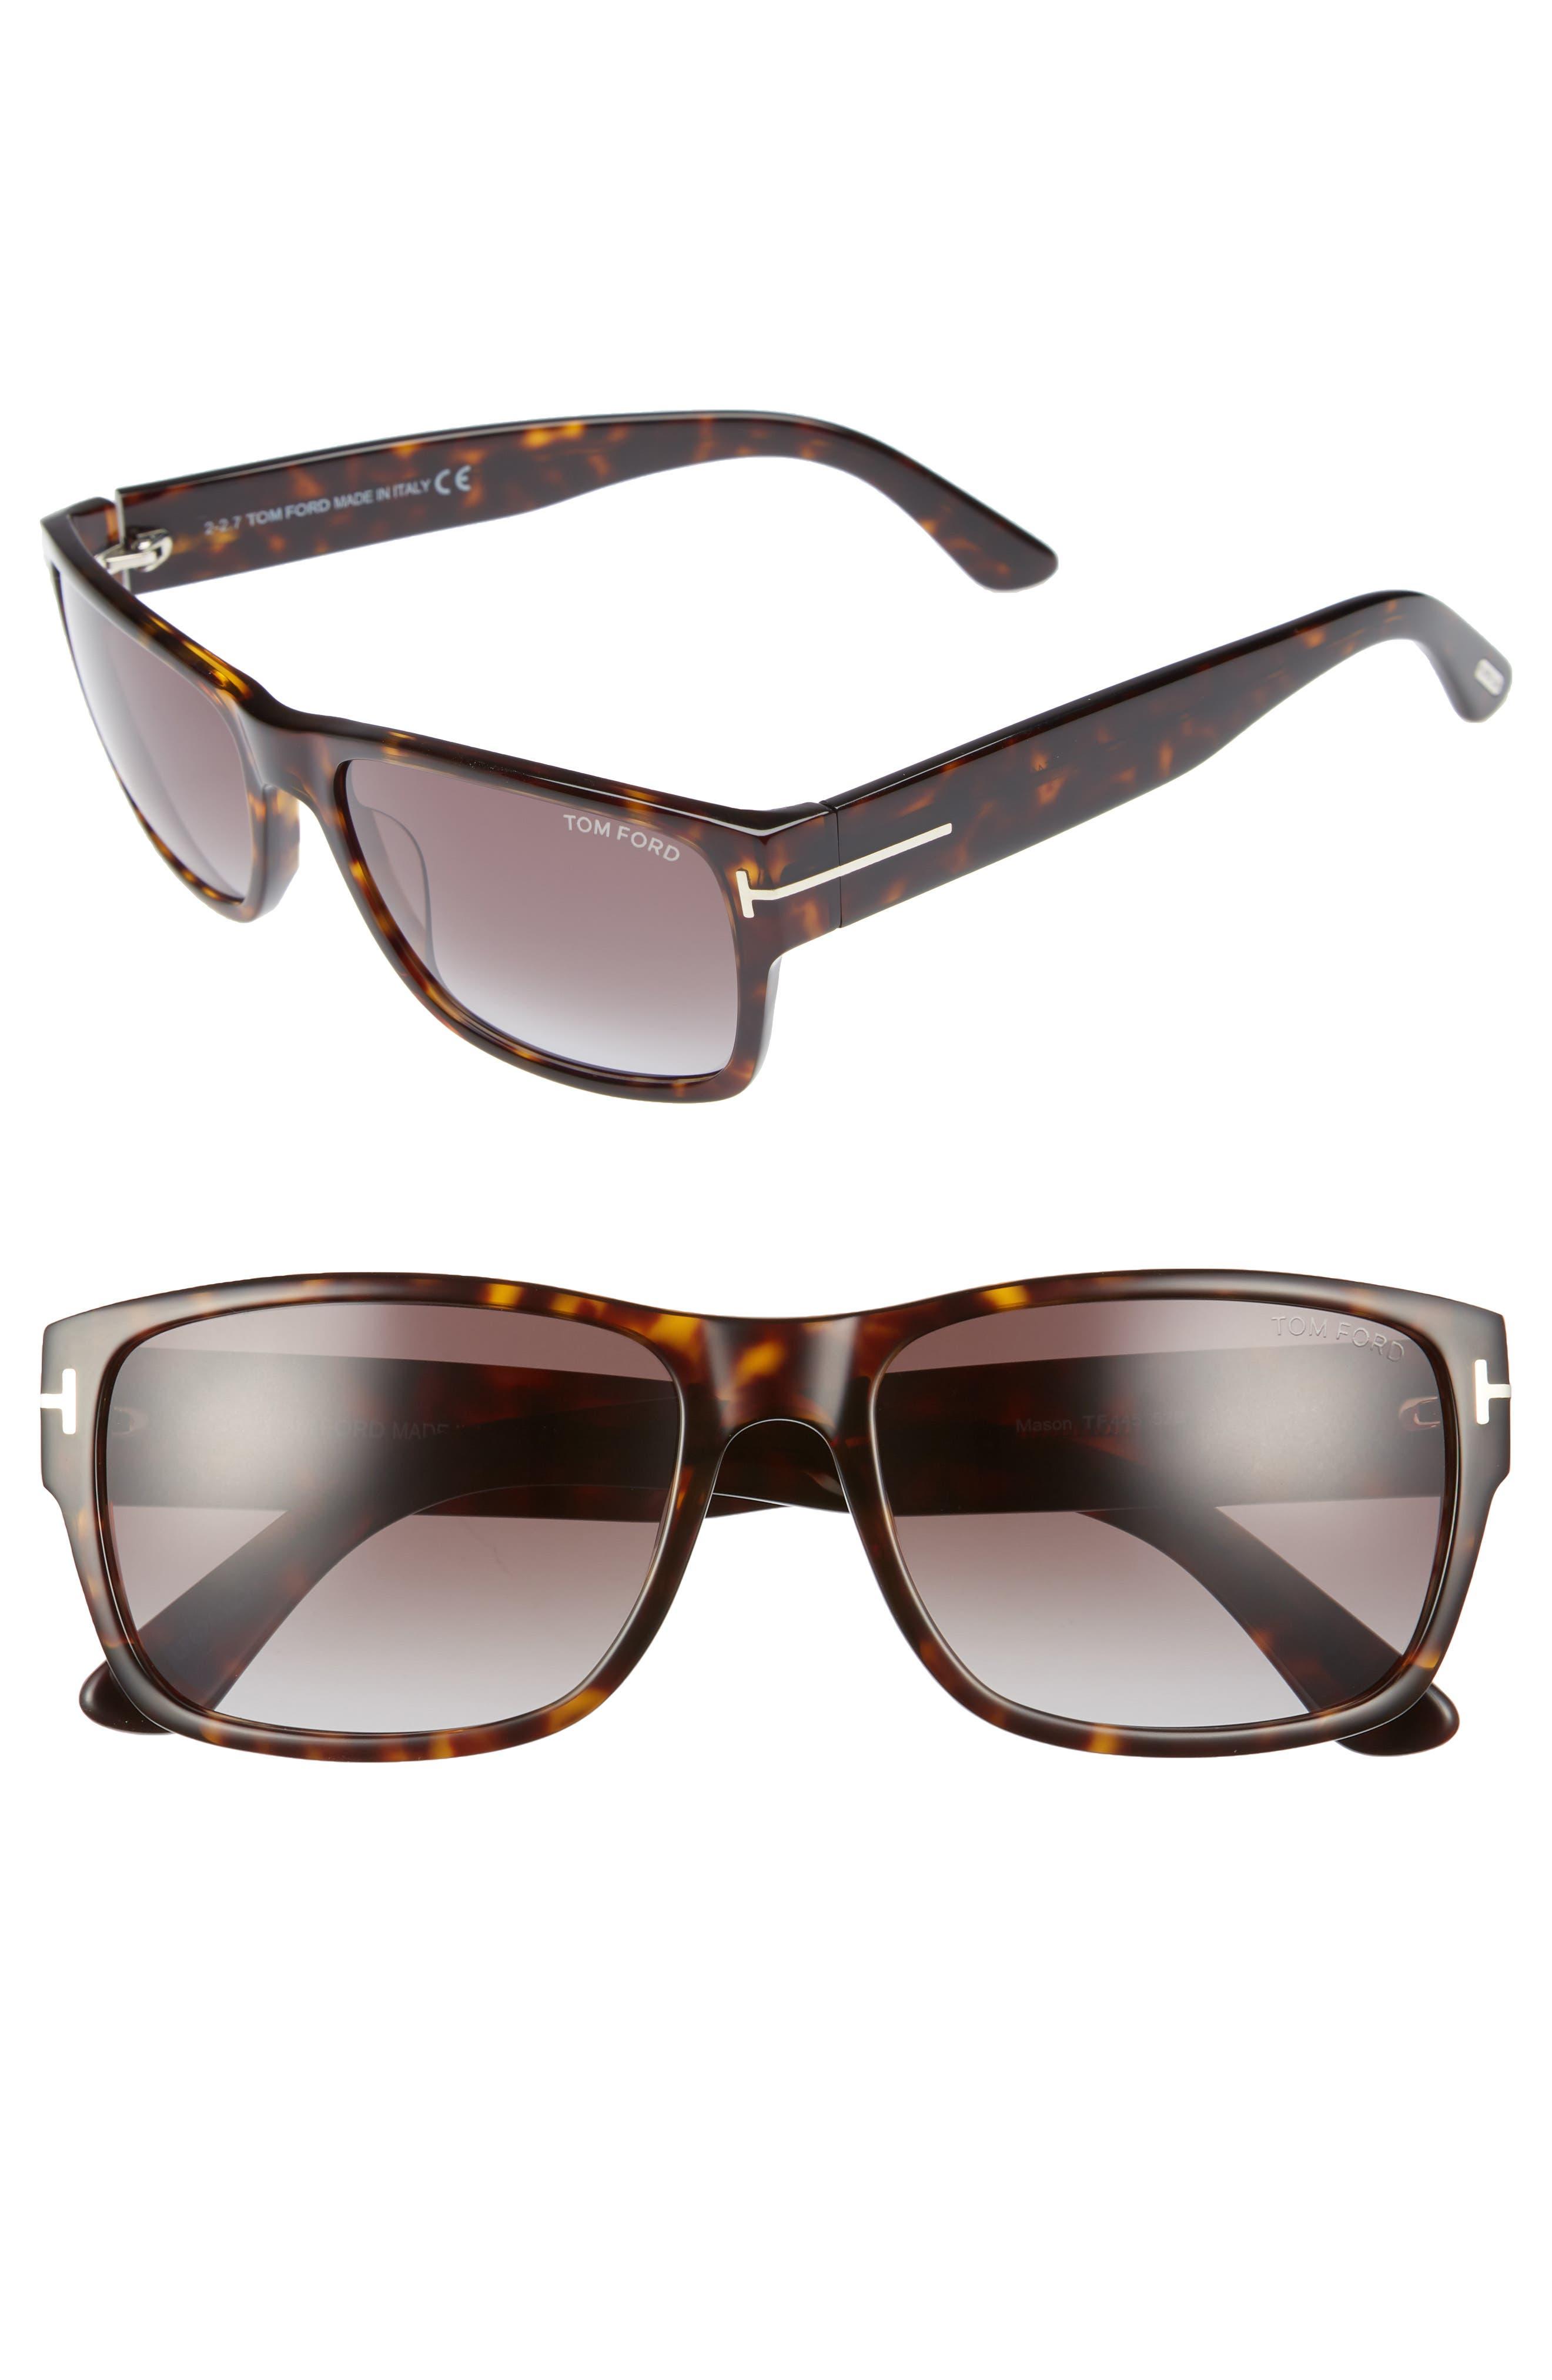 Main Image - Tom Ford 'Mason' 58mm Sunglasses